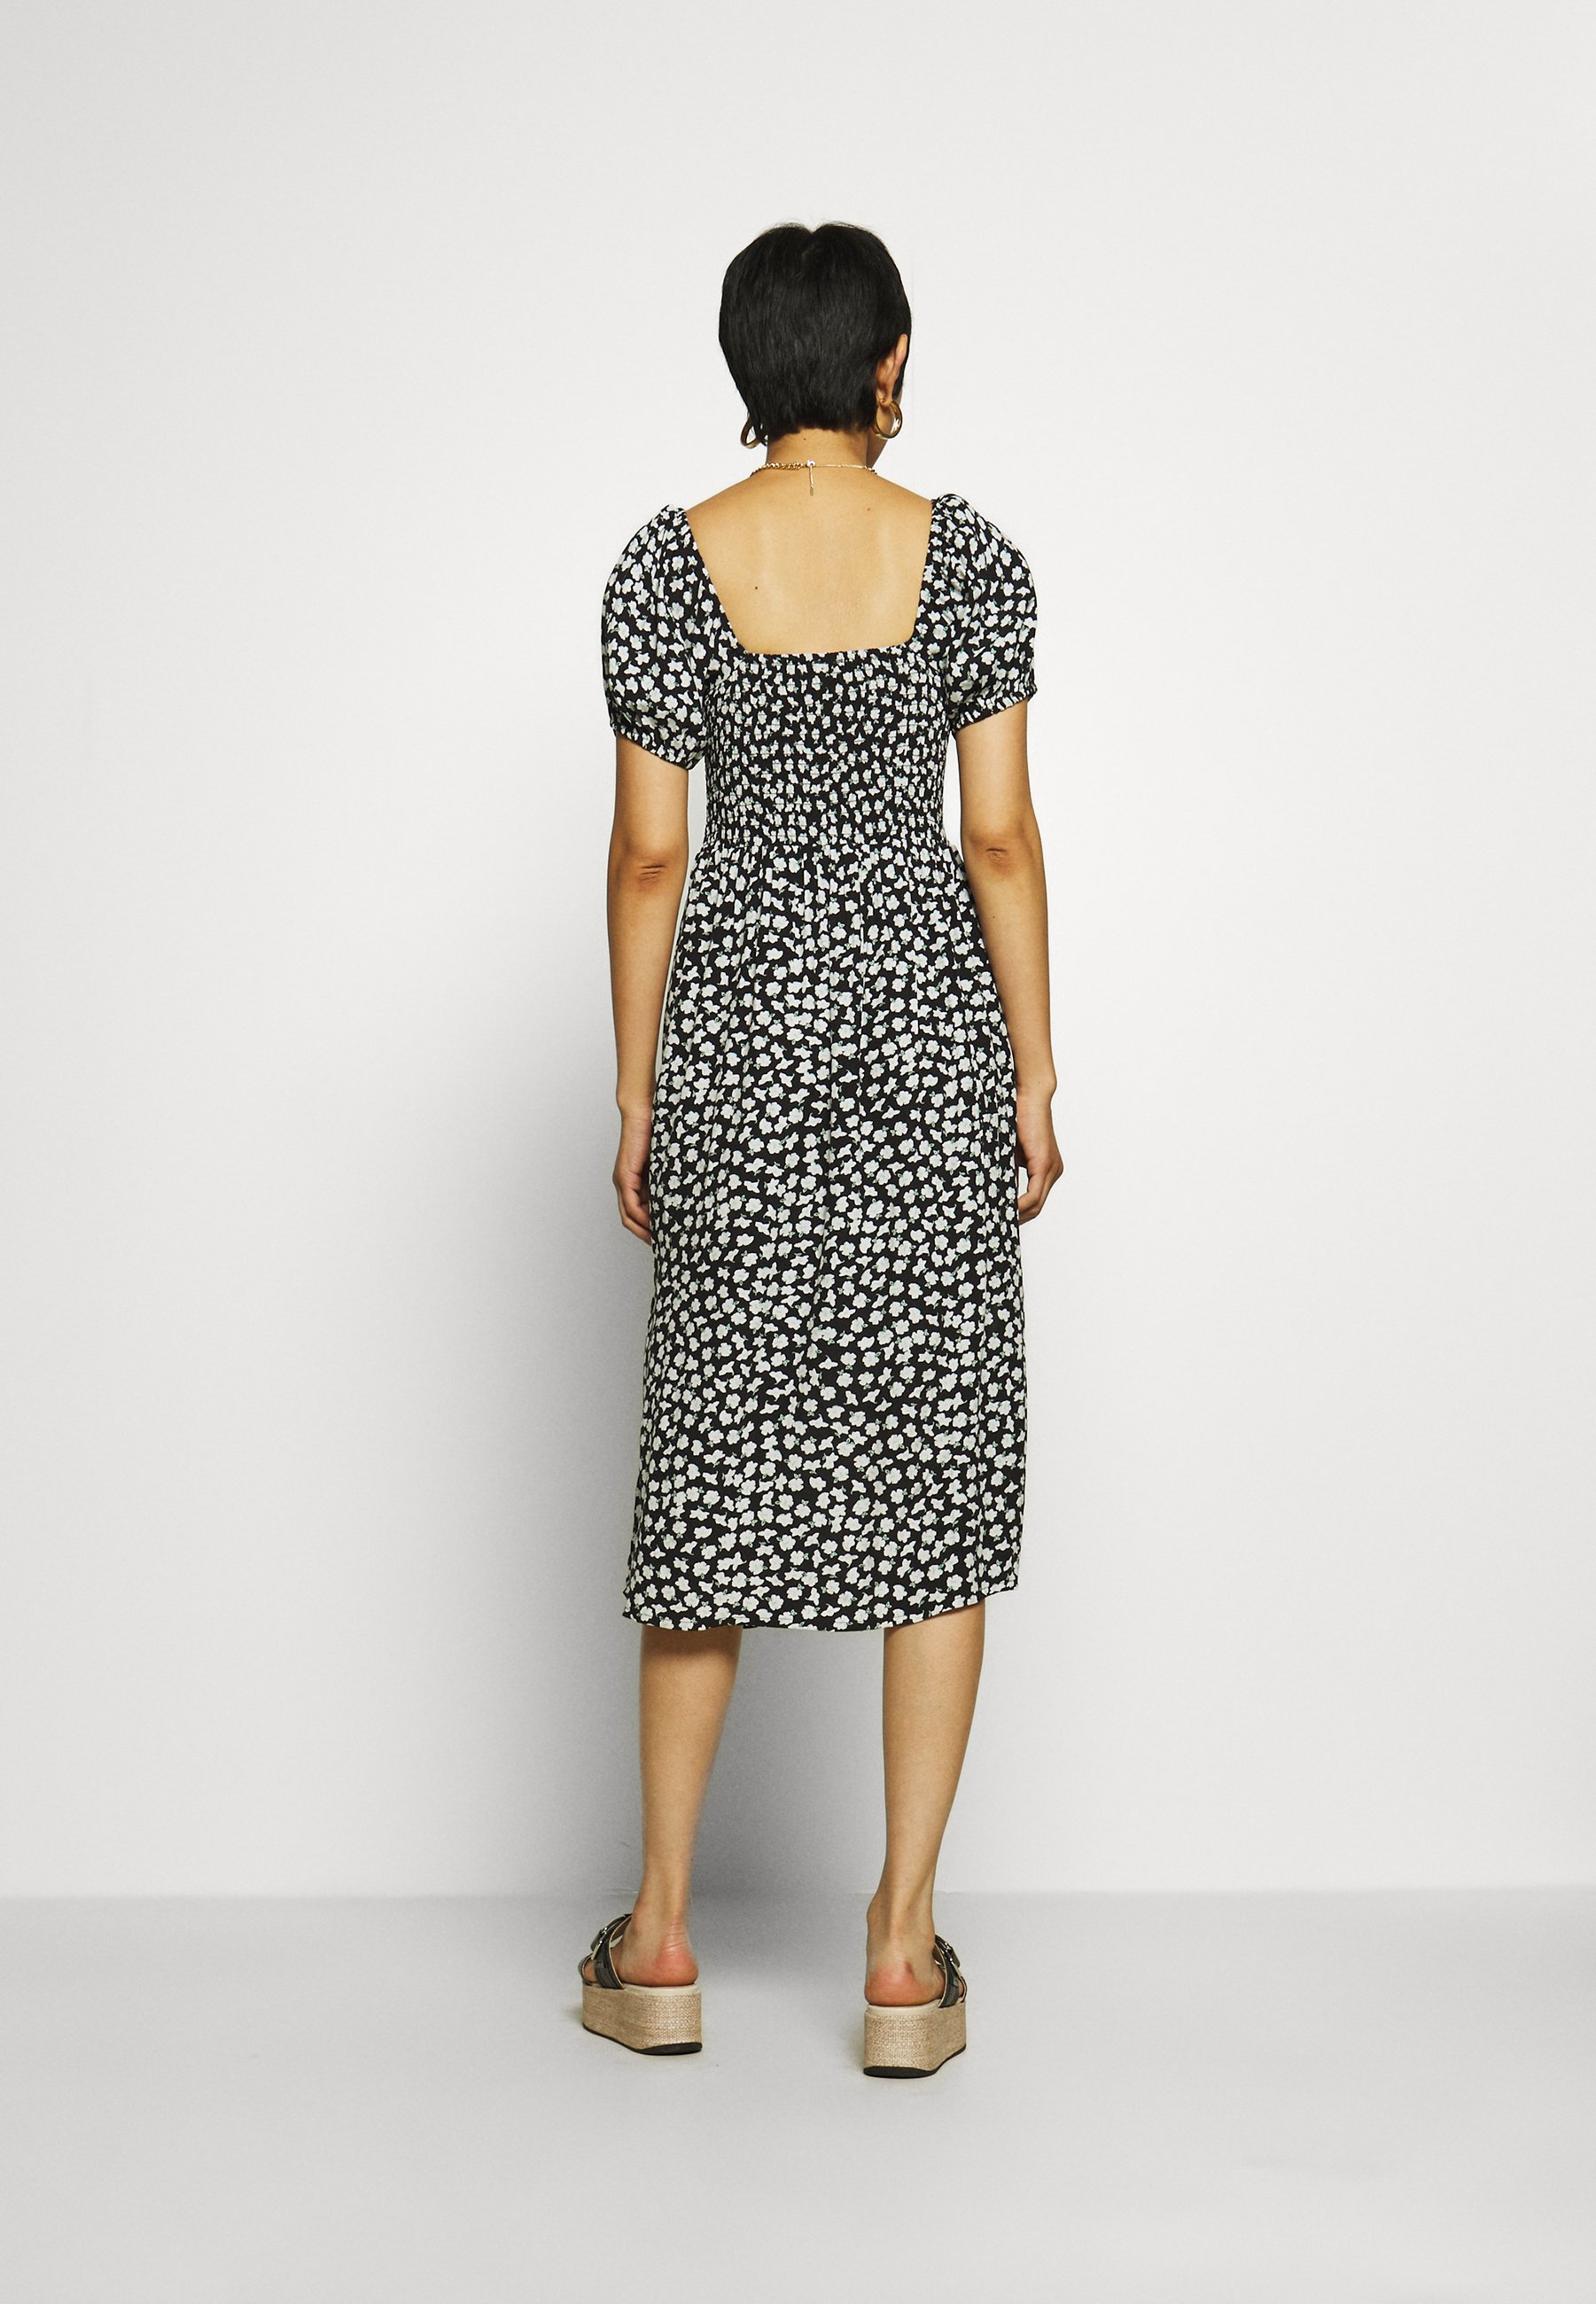 mbyM RINDA - Day dress - black - Women's Clothing KGTlD